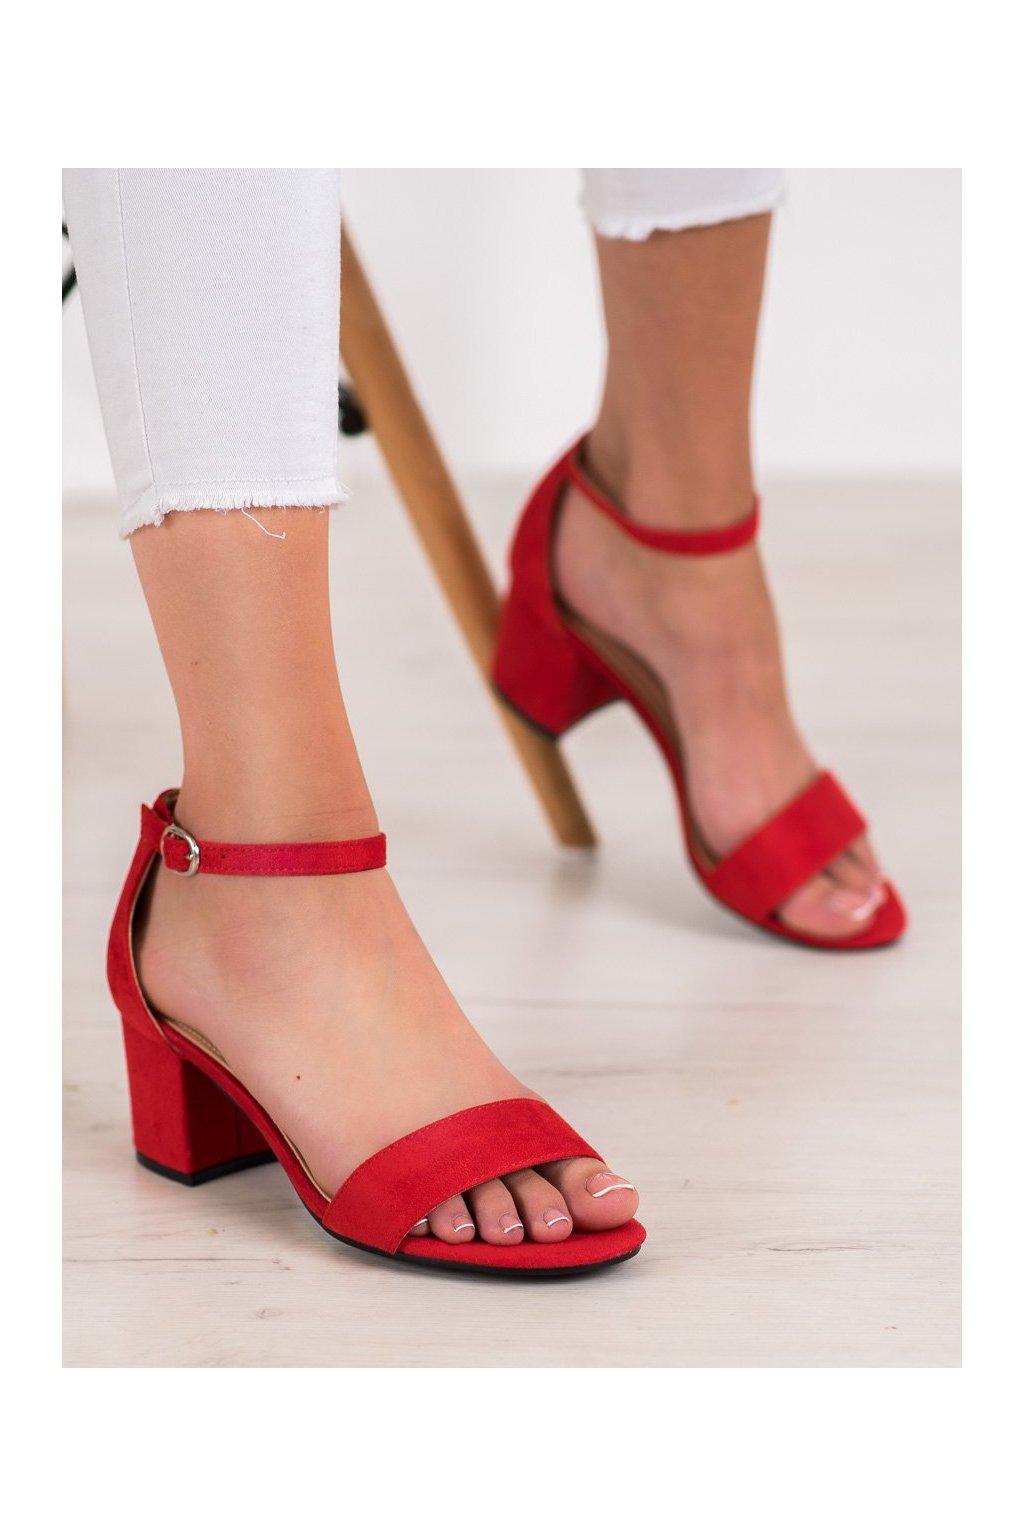 Červené sandále Diamantique NJSK 1170-13R